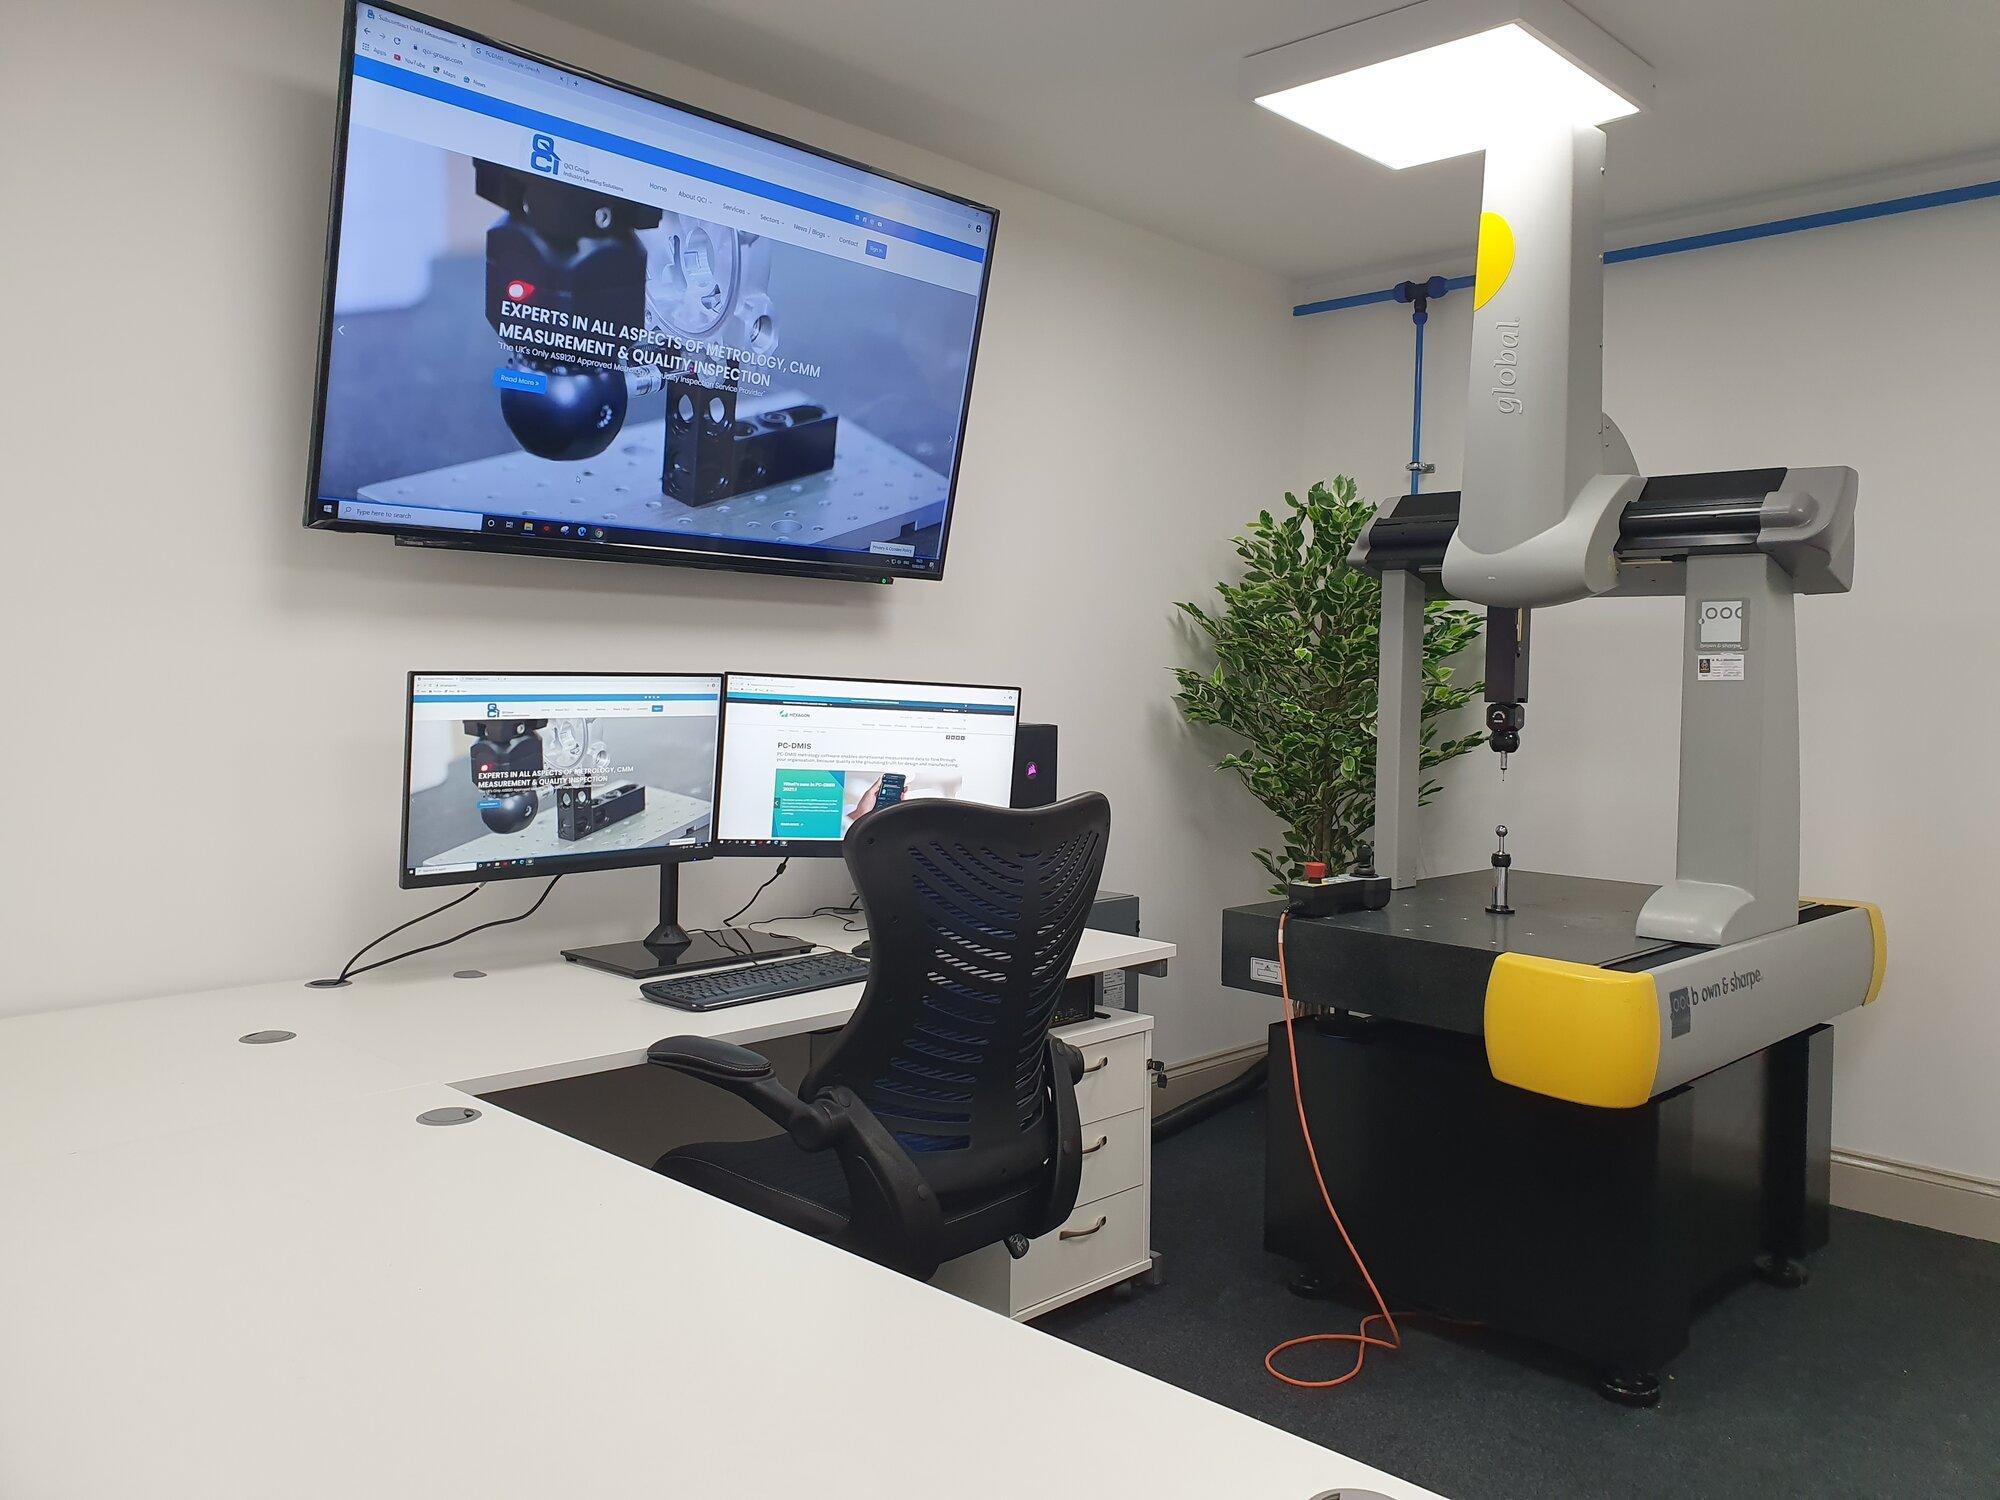 QCI CMM training room with large tv display, and dea CMM machine